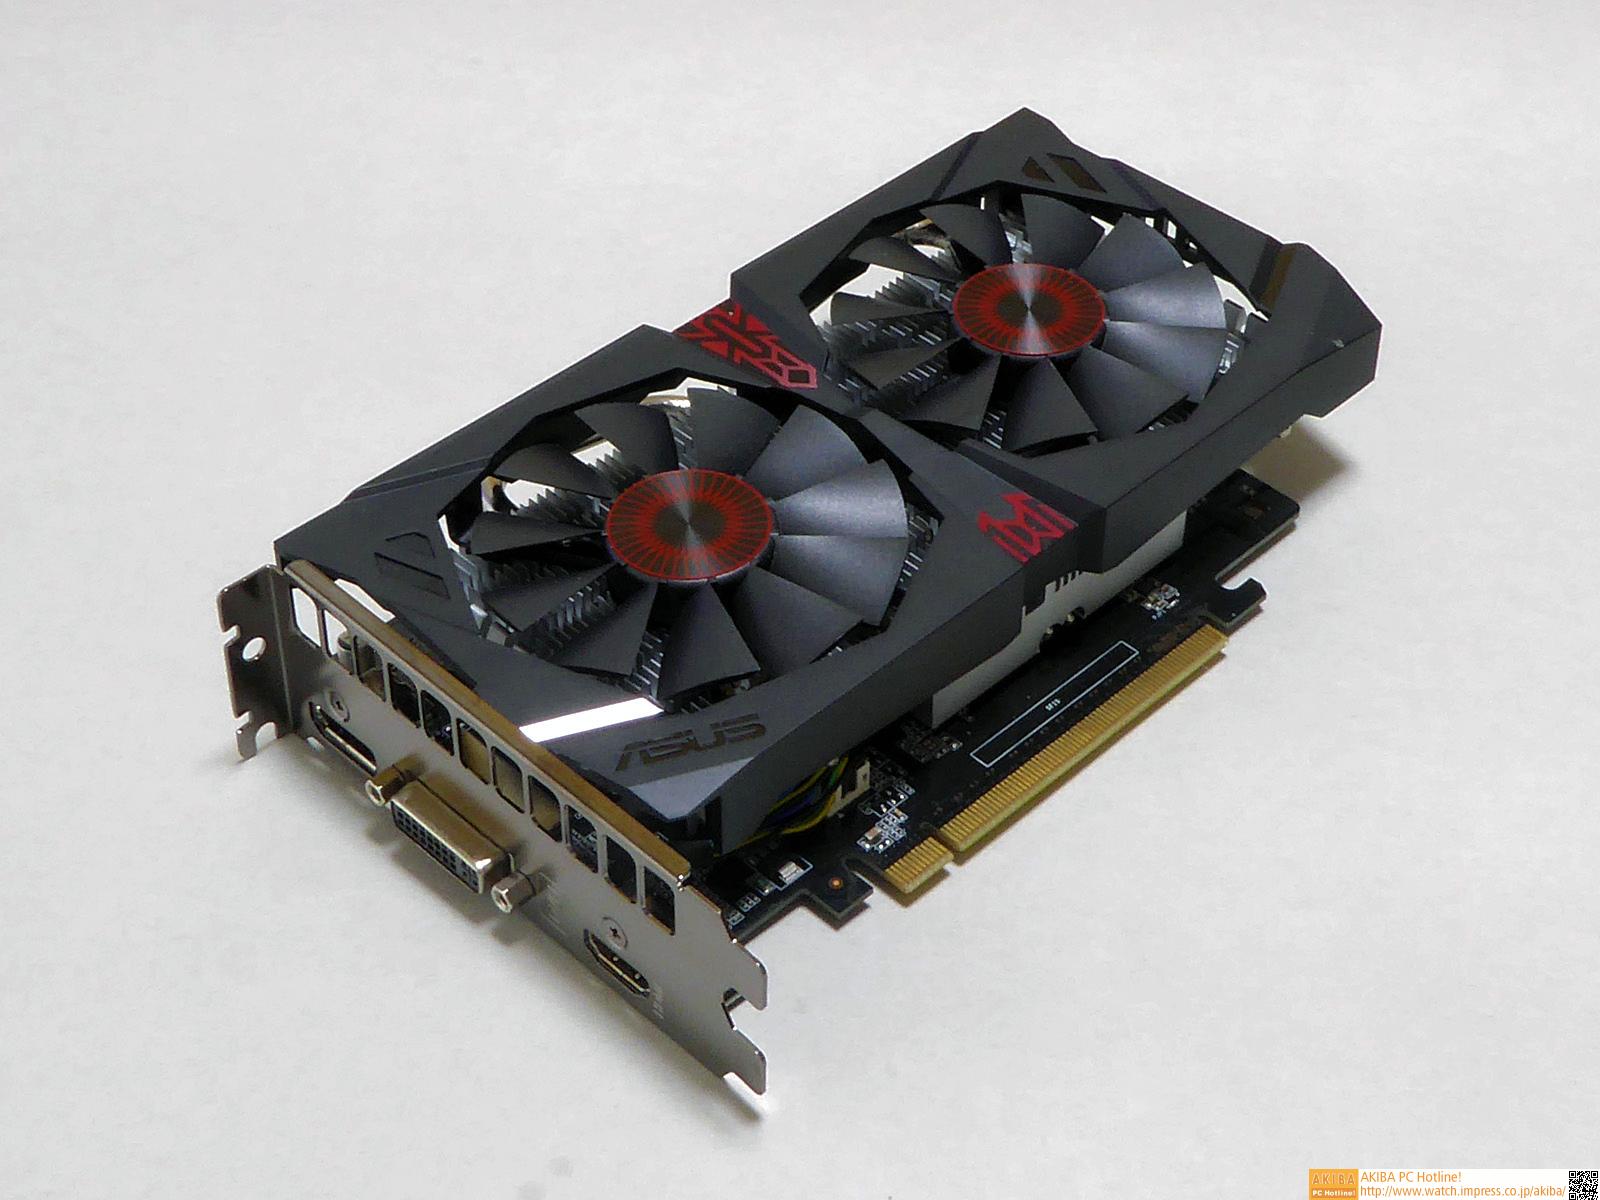 "<strong class="""">ビデオカード:ASUSTeK <a class="""" href=""http://www.asus.com/jp/Graphics_Cards/STRIXGTX750TIOC2GD5/"">STRIX-GTX750TI-OC-2GD5</a>(NVIDIA GeForce GTX 750 Ti)</strong><br class="""">NVIDIA GeForce GTX 750 Tiを搭載するミドルレンジビデオカード。GPU温度が50℃を越えたときのみファンを回転、以下では回転を停止する設計により、2D使用時や3Dでも低負荷な処理では「ゼロノイズ」を実現する。GPUに直接ヒートパイプを接触させ、熱輸送の効率化を狙った「DirectCU II」クーラーは放熱効果が高く、搭載する2基のファンは回転時でも静かだ。同時に、基板上のコンデンサやチョークコイルなども、高耐久、高品質の部品を採用している。"